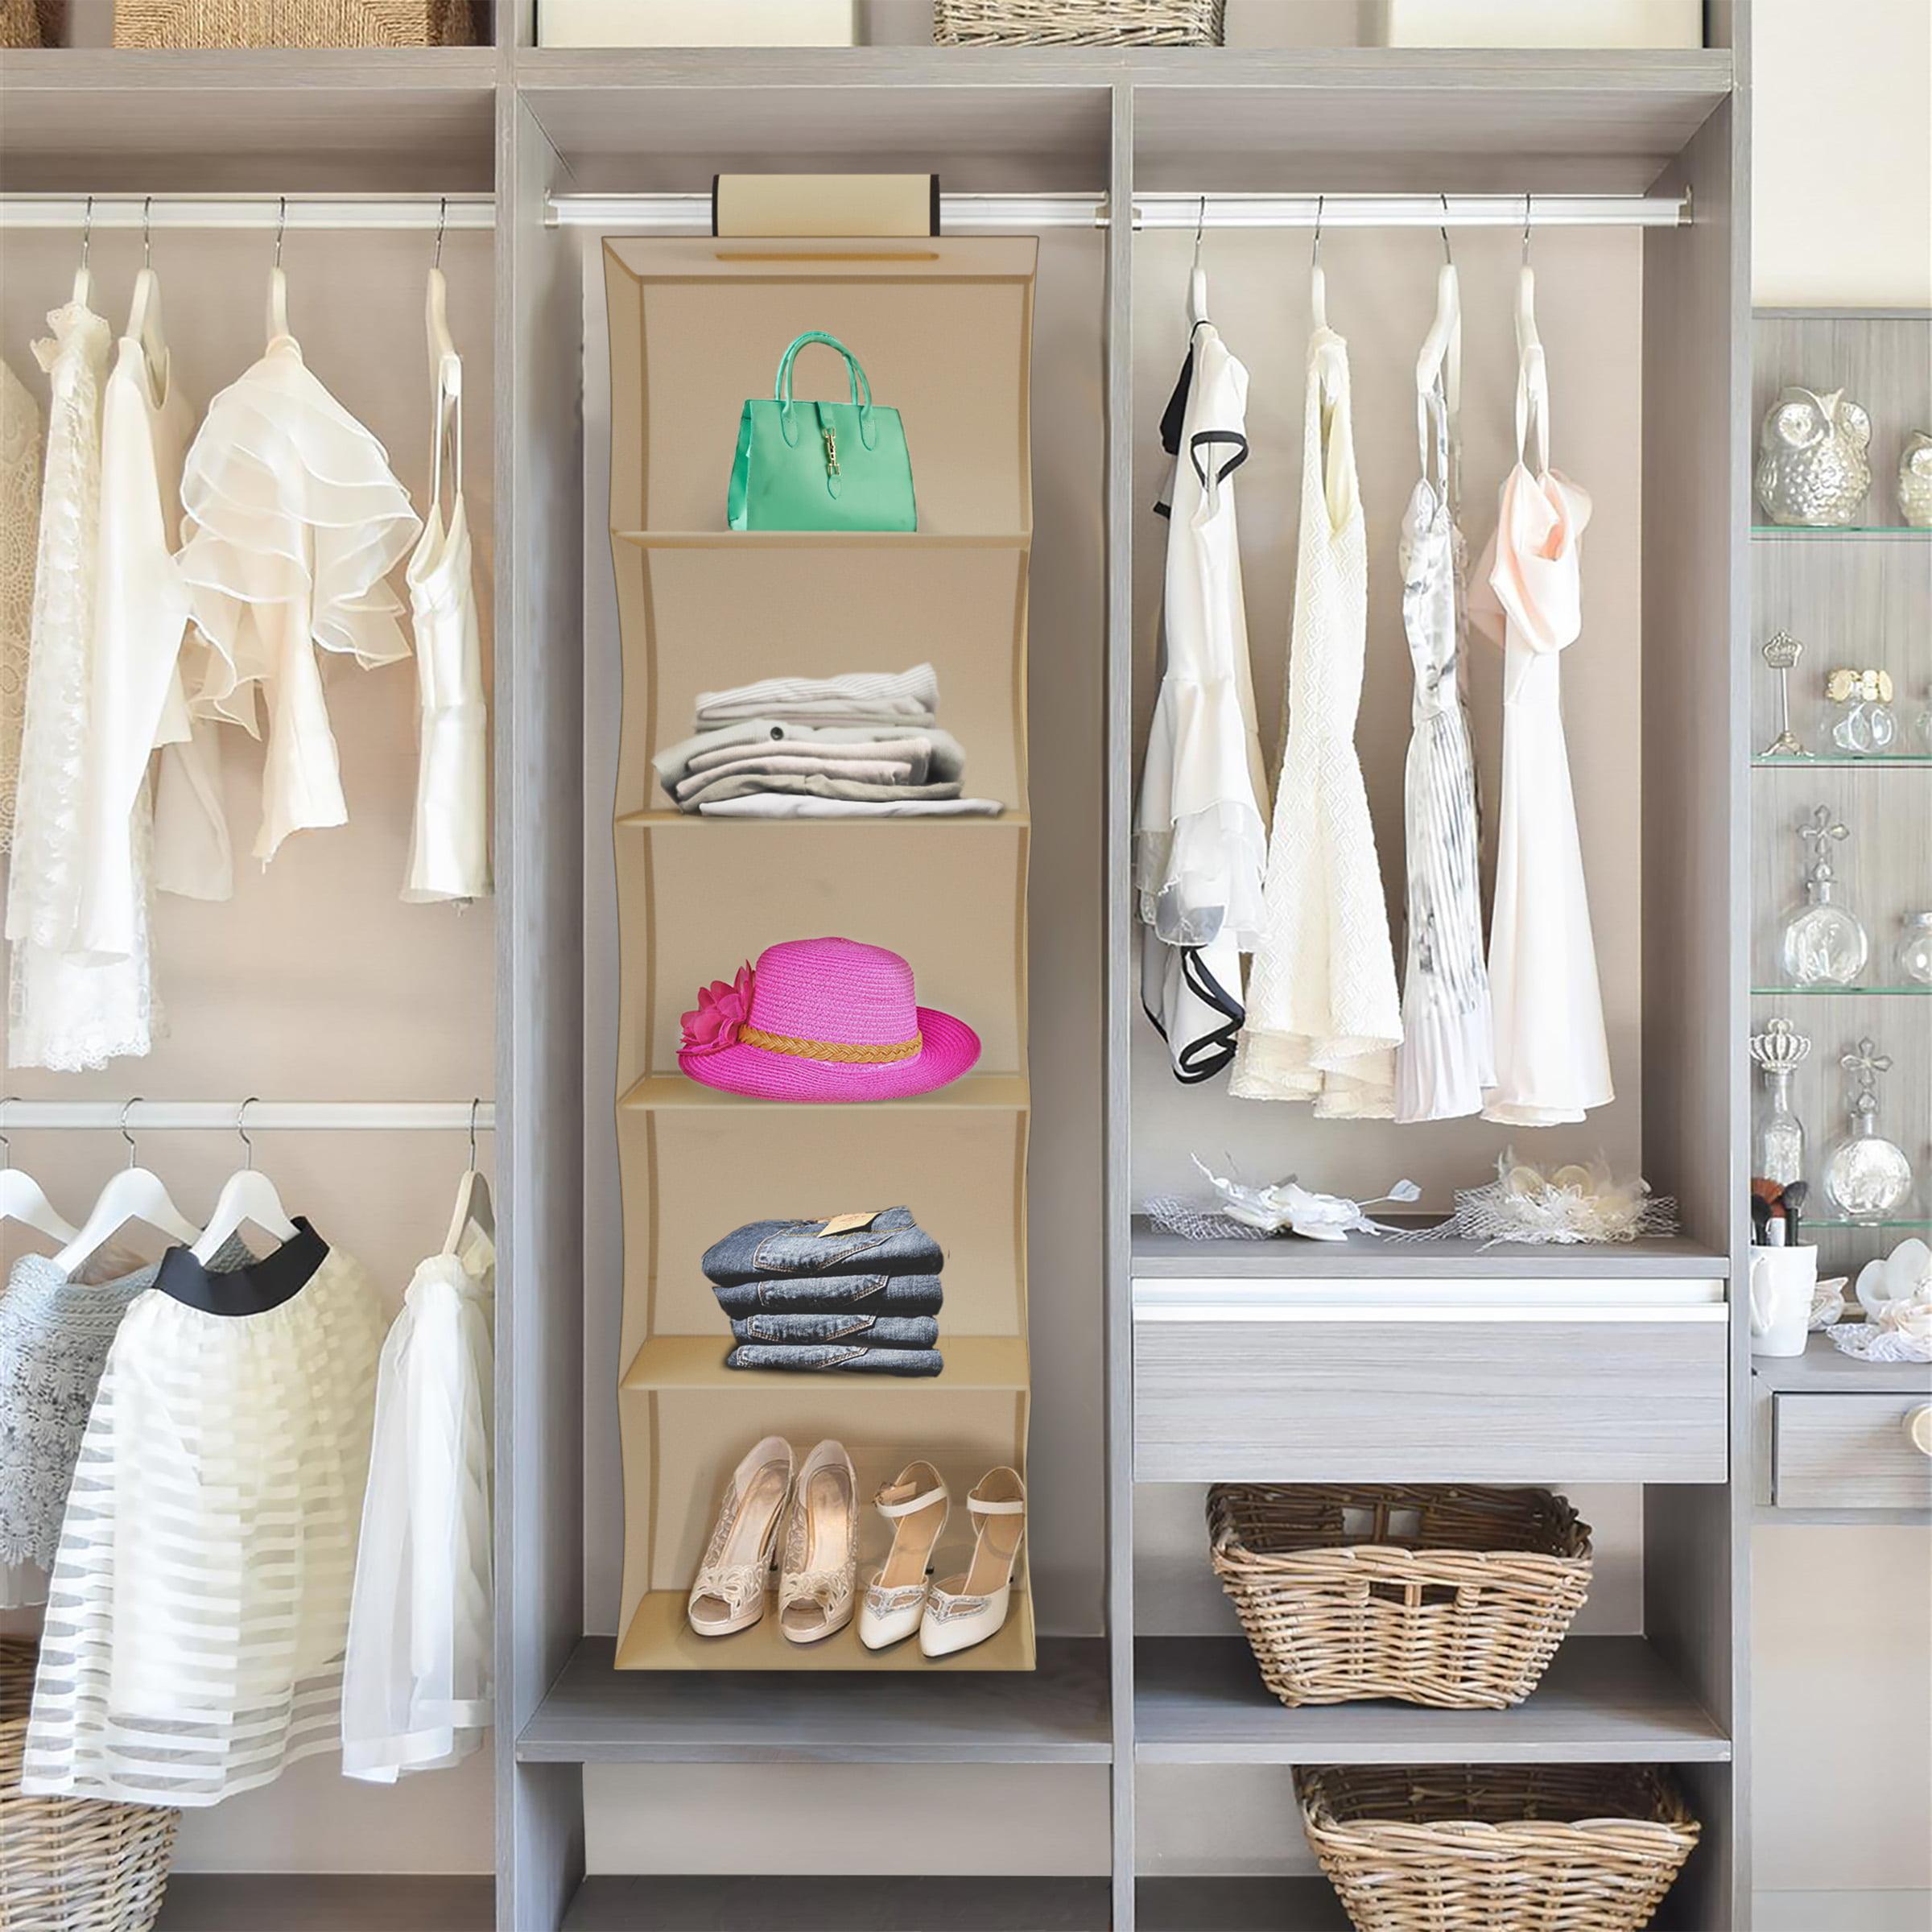 Hanging Closet Organizer-5 Shelf Storage- Space Saving for Small Homes, Dorms, Apartments- Bedroom, Bathroom, or Nursery Essentials by Lavish Home